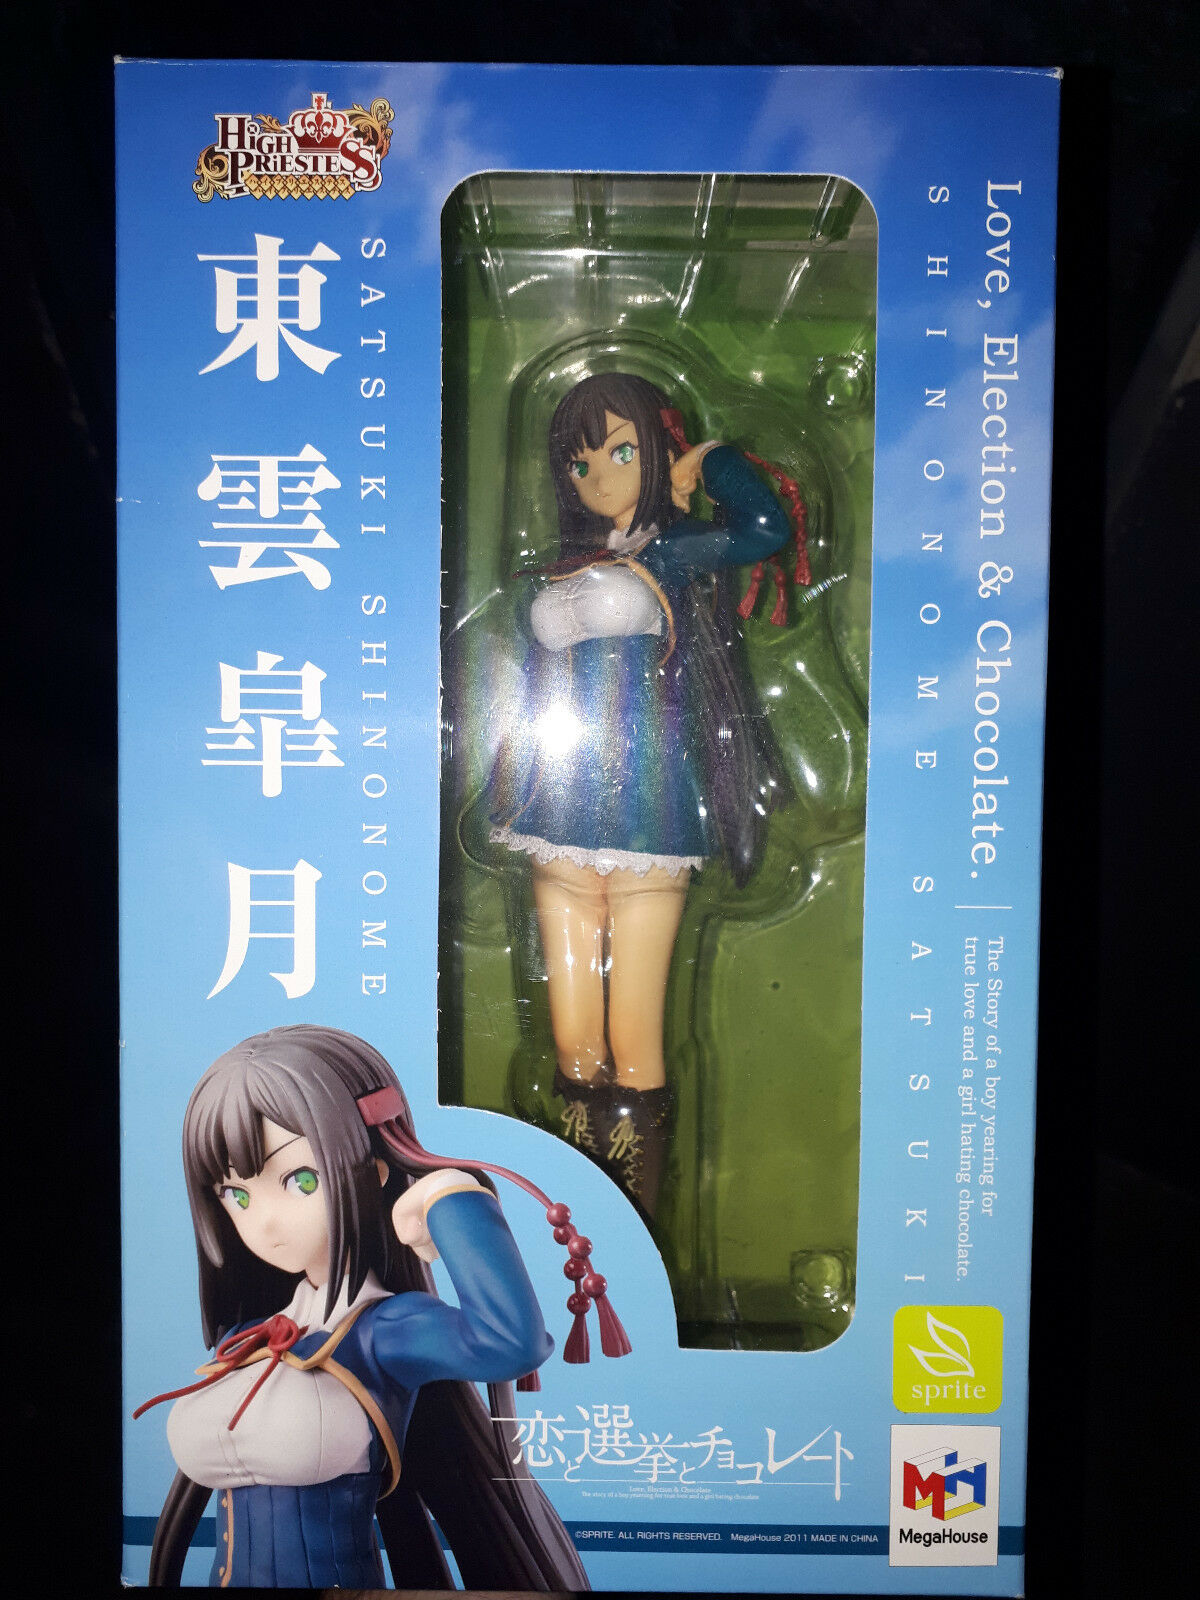 SATSUKI SHINONOME - High Priestess; MEGAHOUSE; Love, Election & Chocolate (Plast